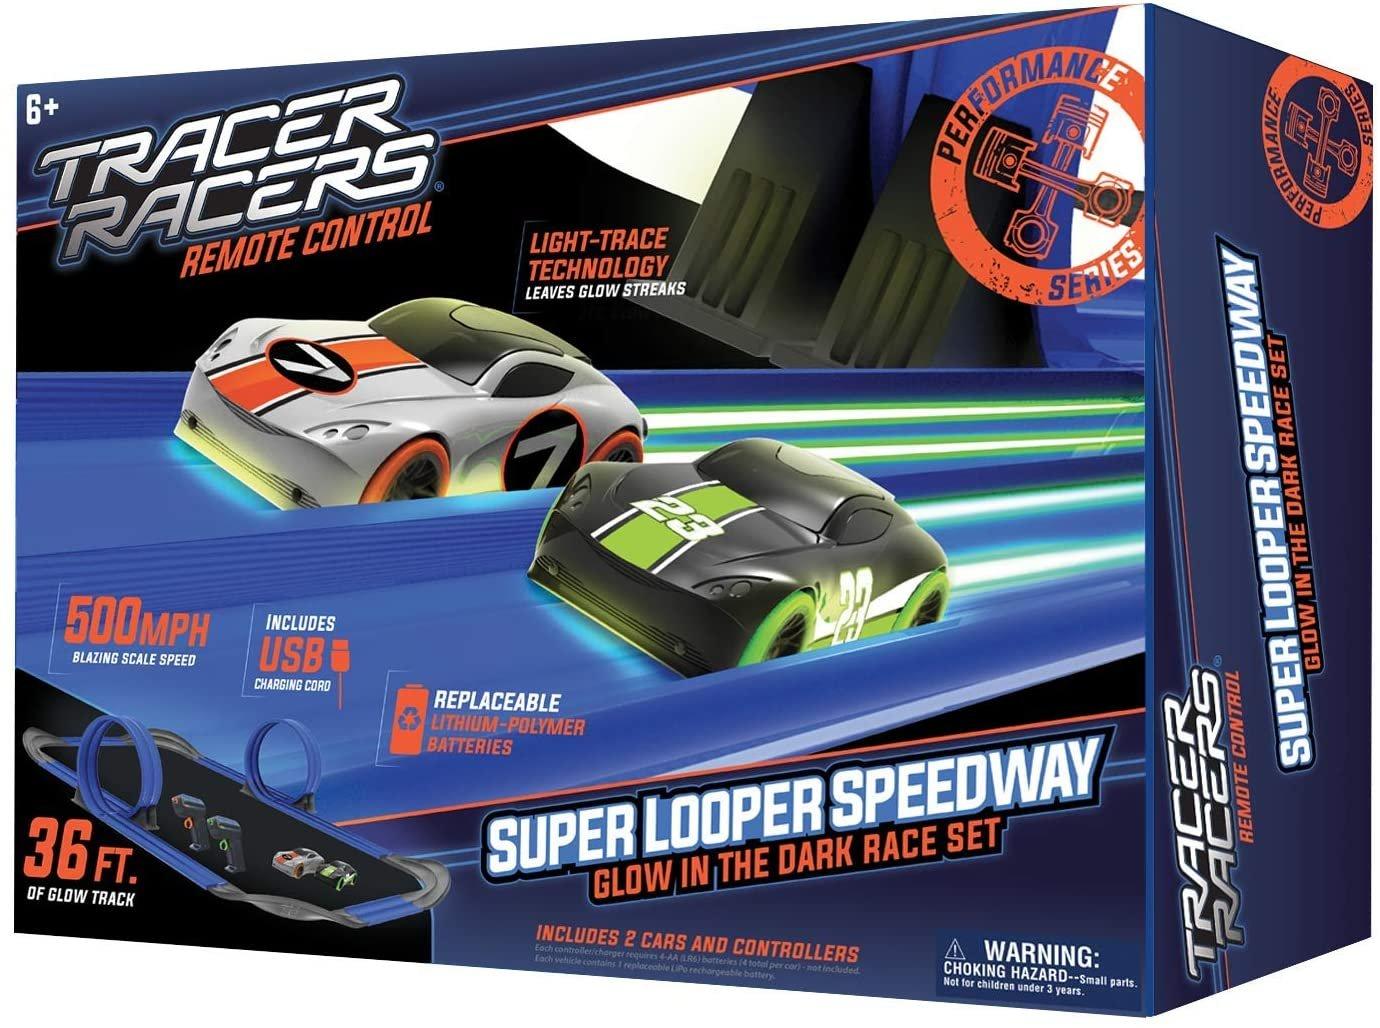 SD Toyz Tracer Racers Super Looper Speedway Glow in the Dark Raceway